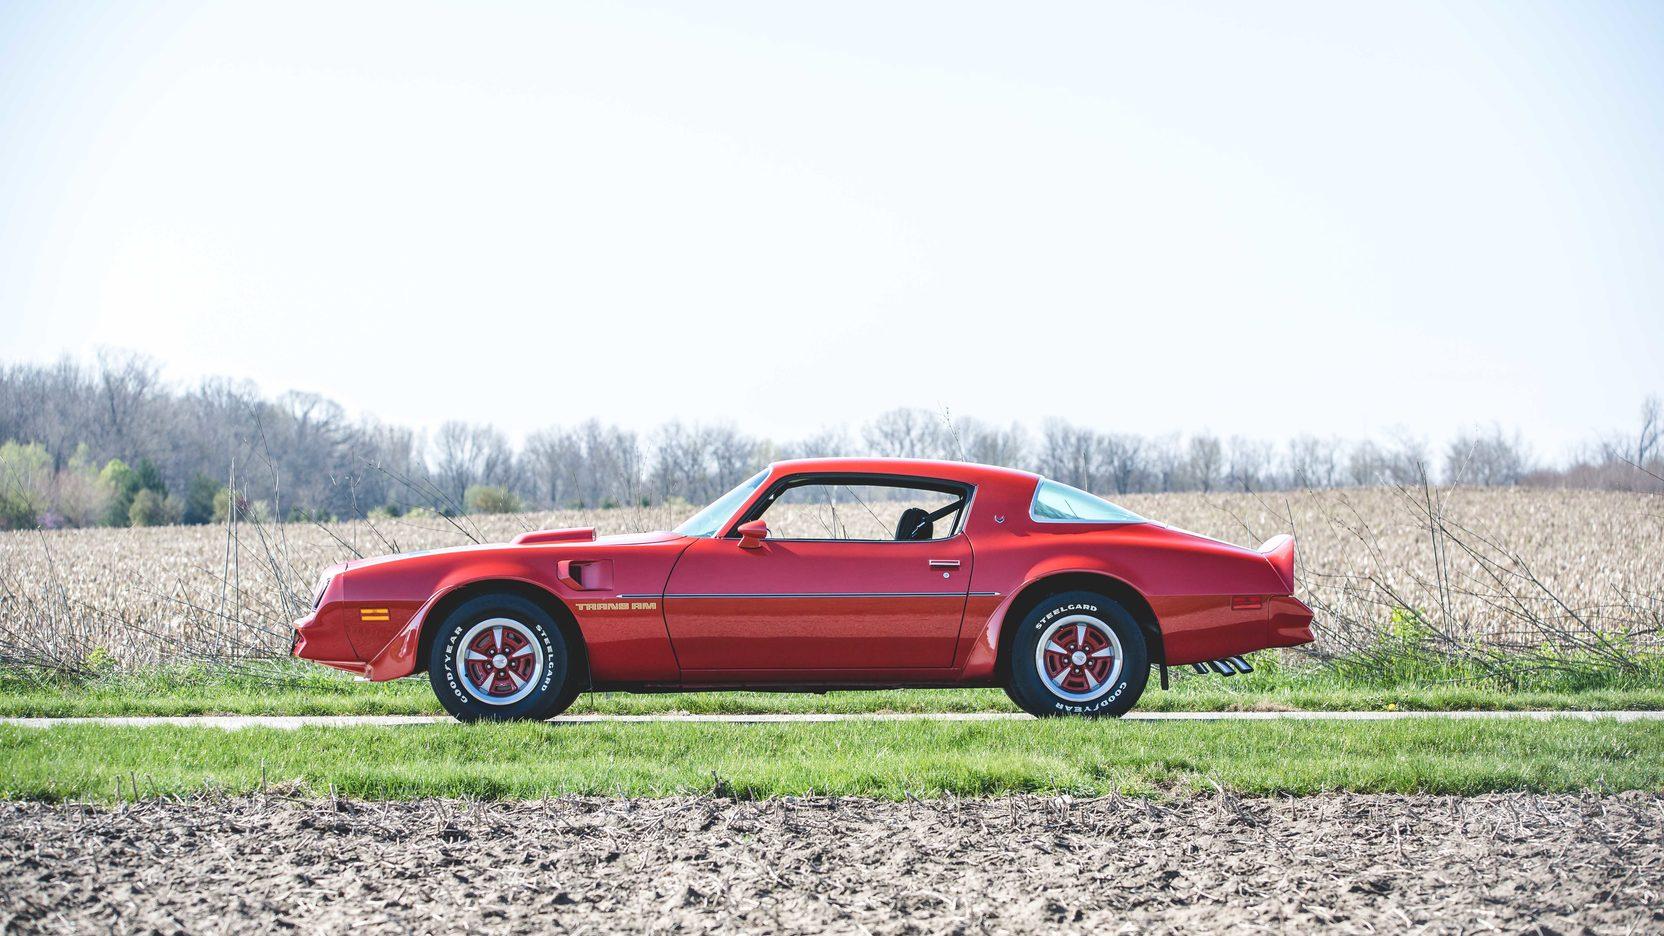 1978 Pontiac Firebird Trans Am profile